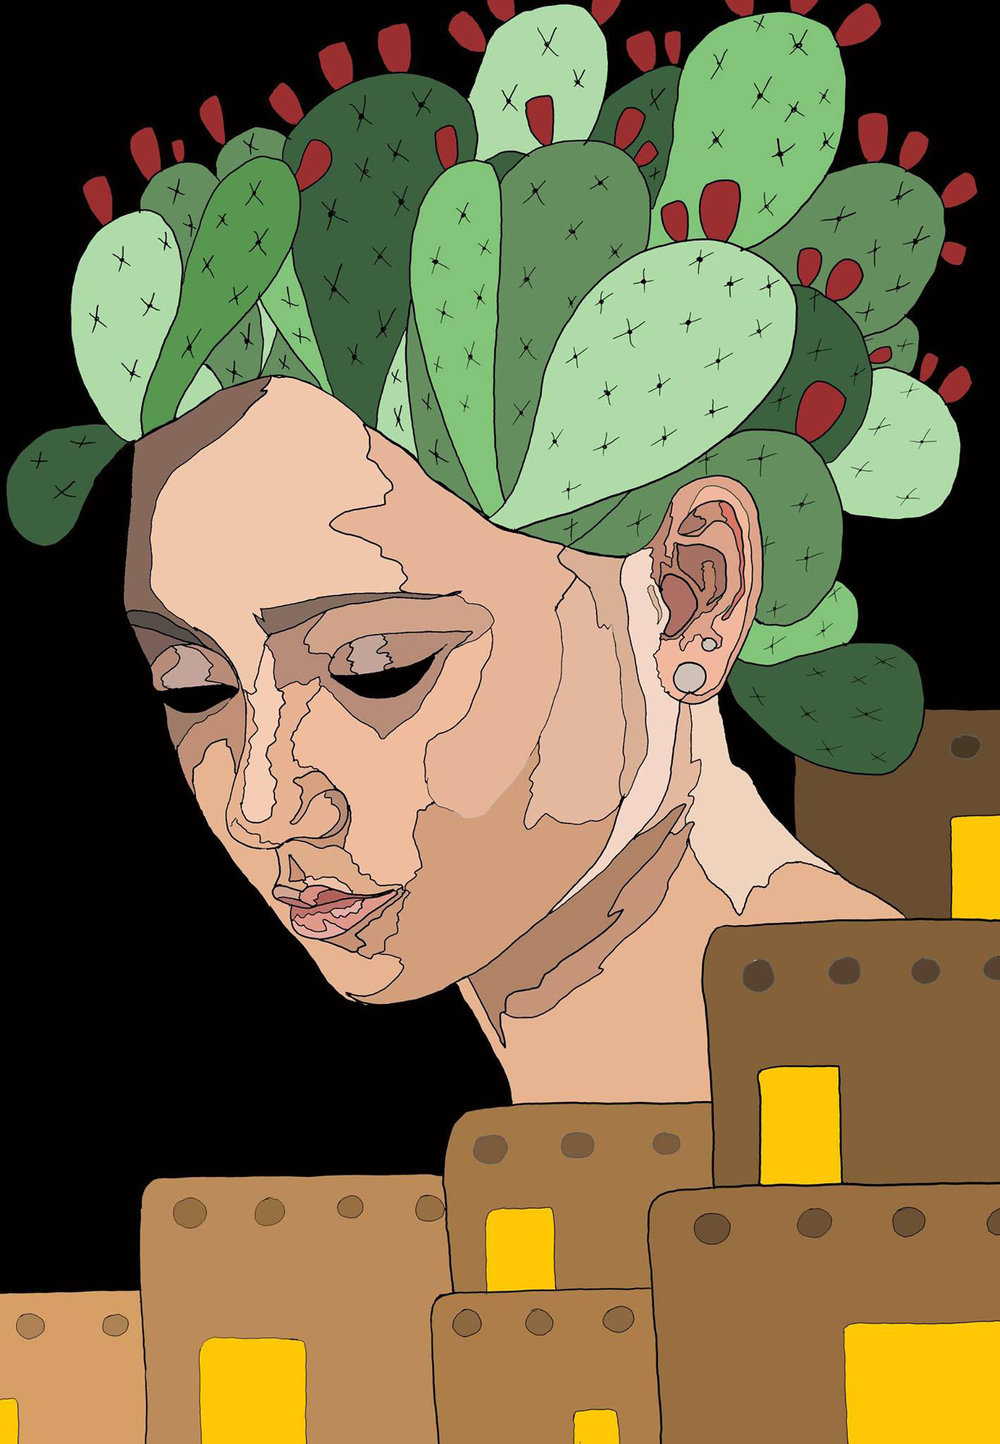 Art by Maya Peña